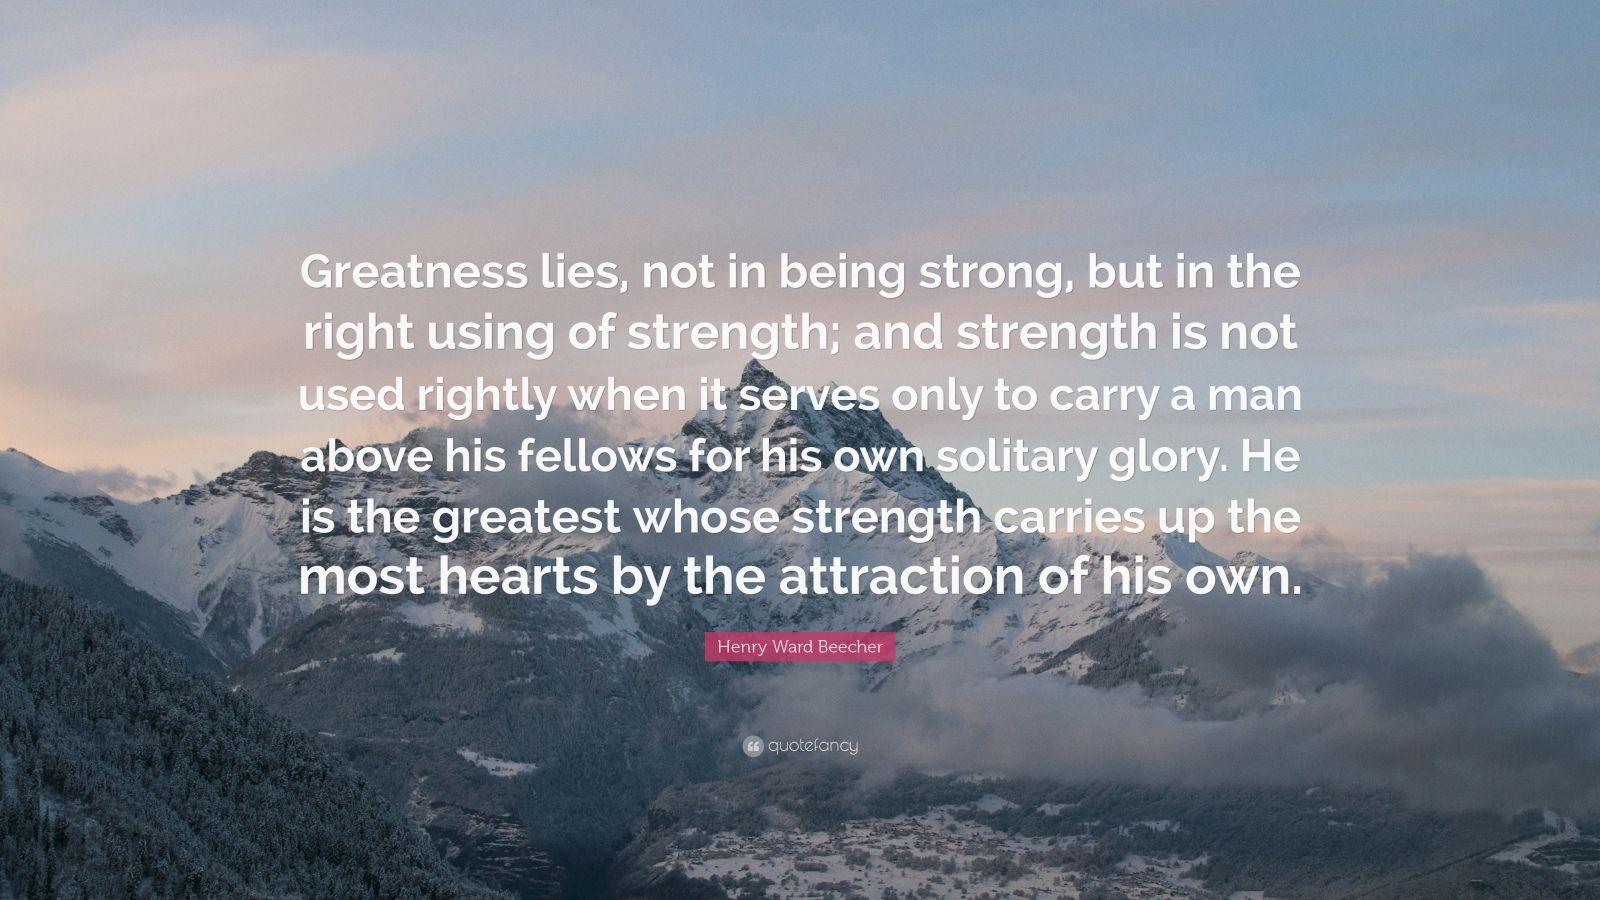 A Prayer Praising God's Greatness